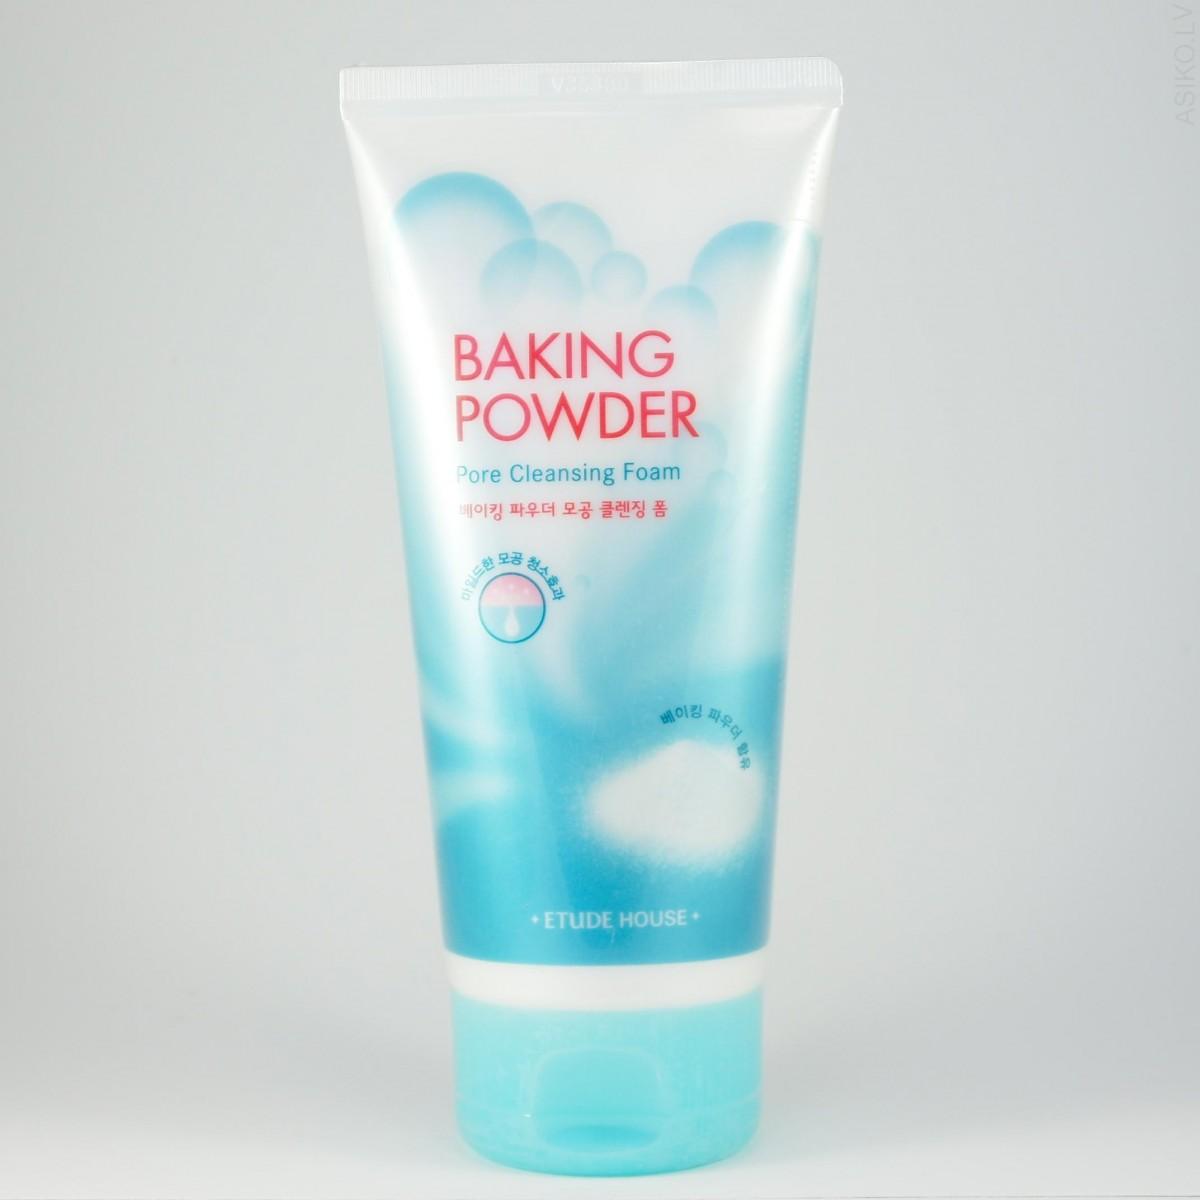 Baking Powder Pore Cleansing Foam [Etude House]